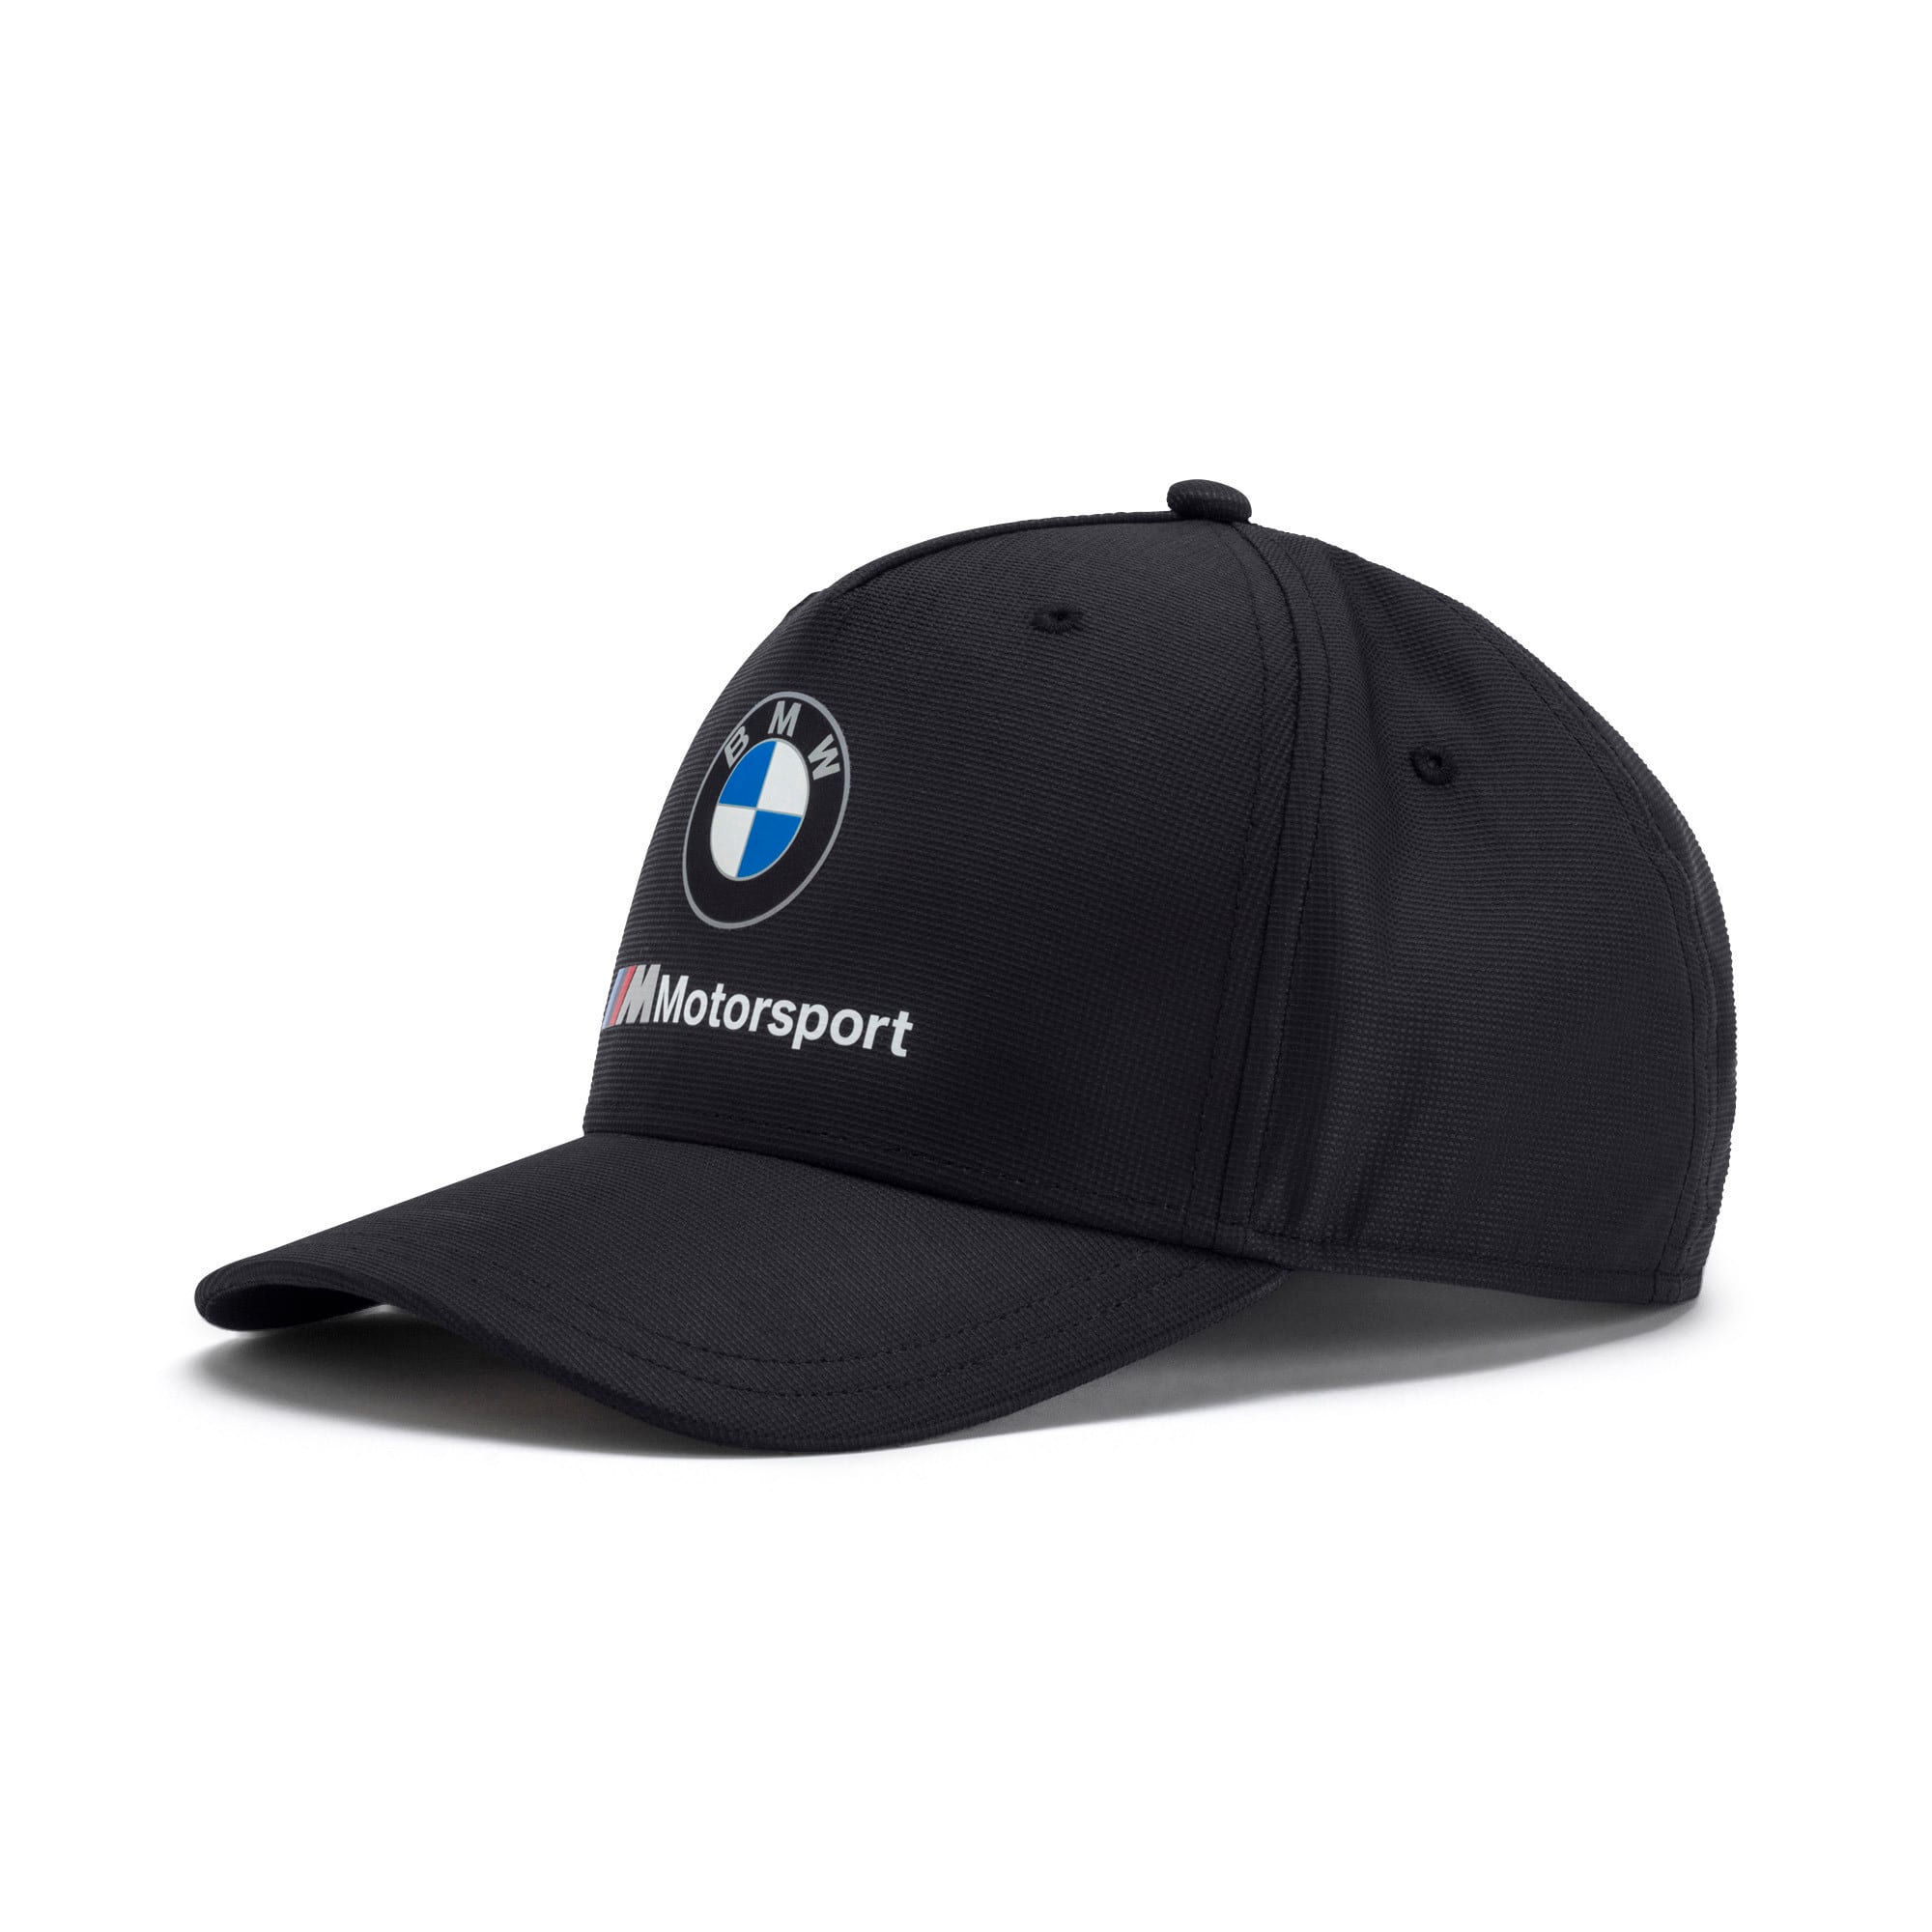 Thumbnail 1 of BMW Motorsport Cap, Anthracite, medium